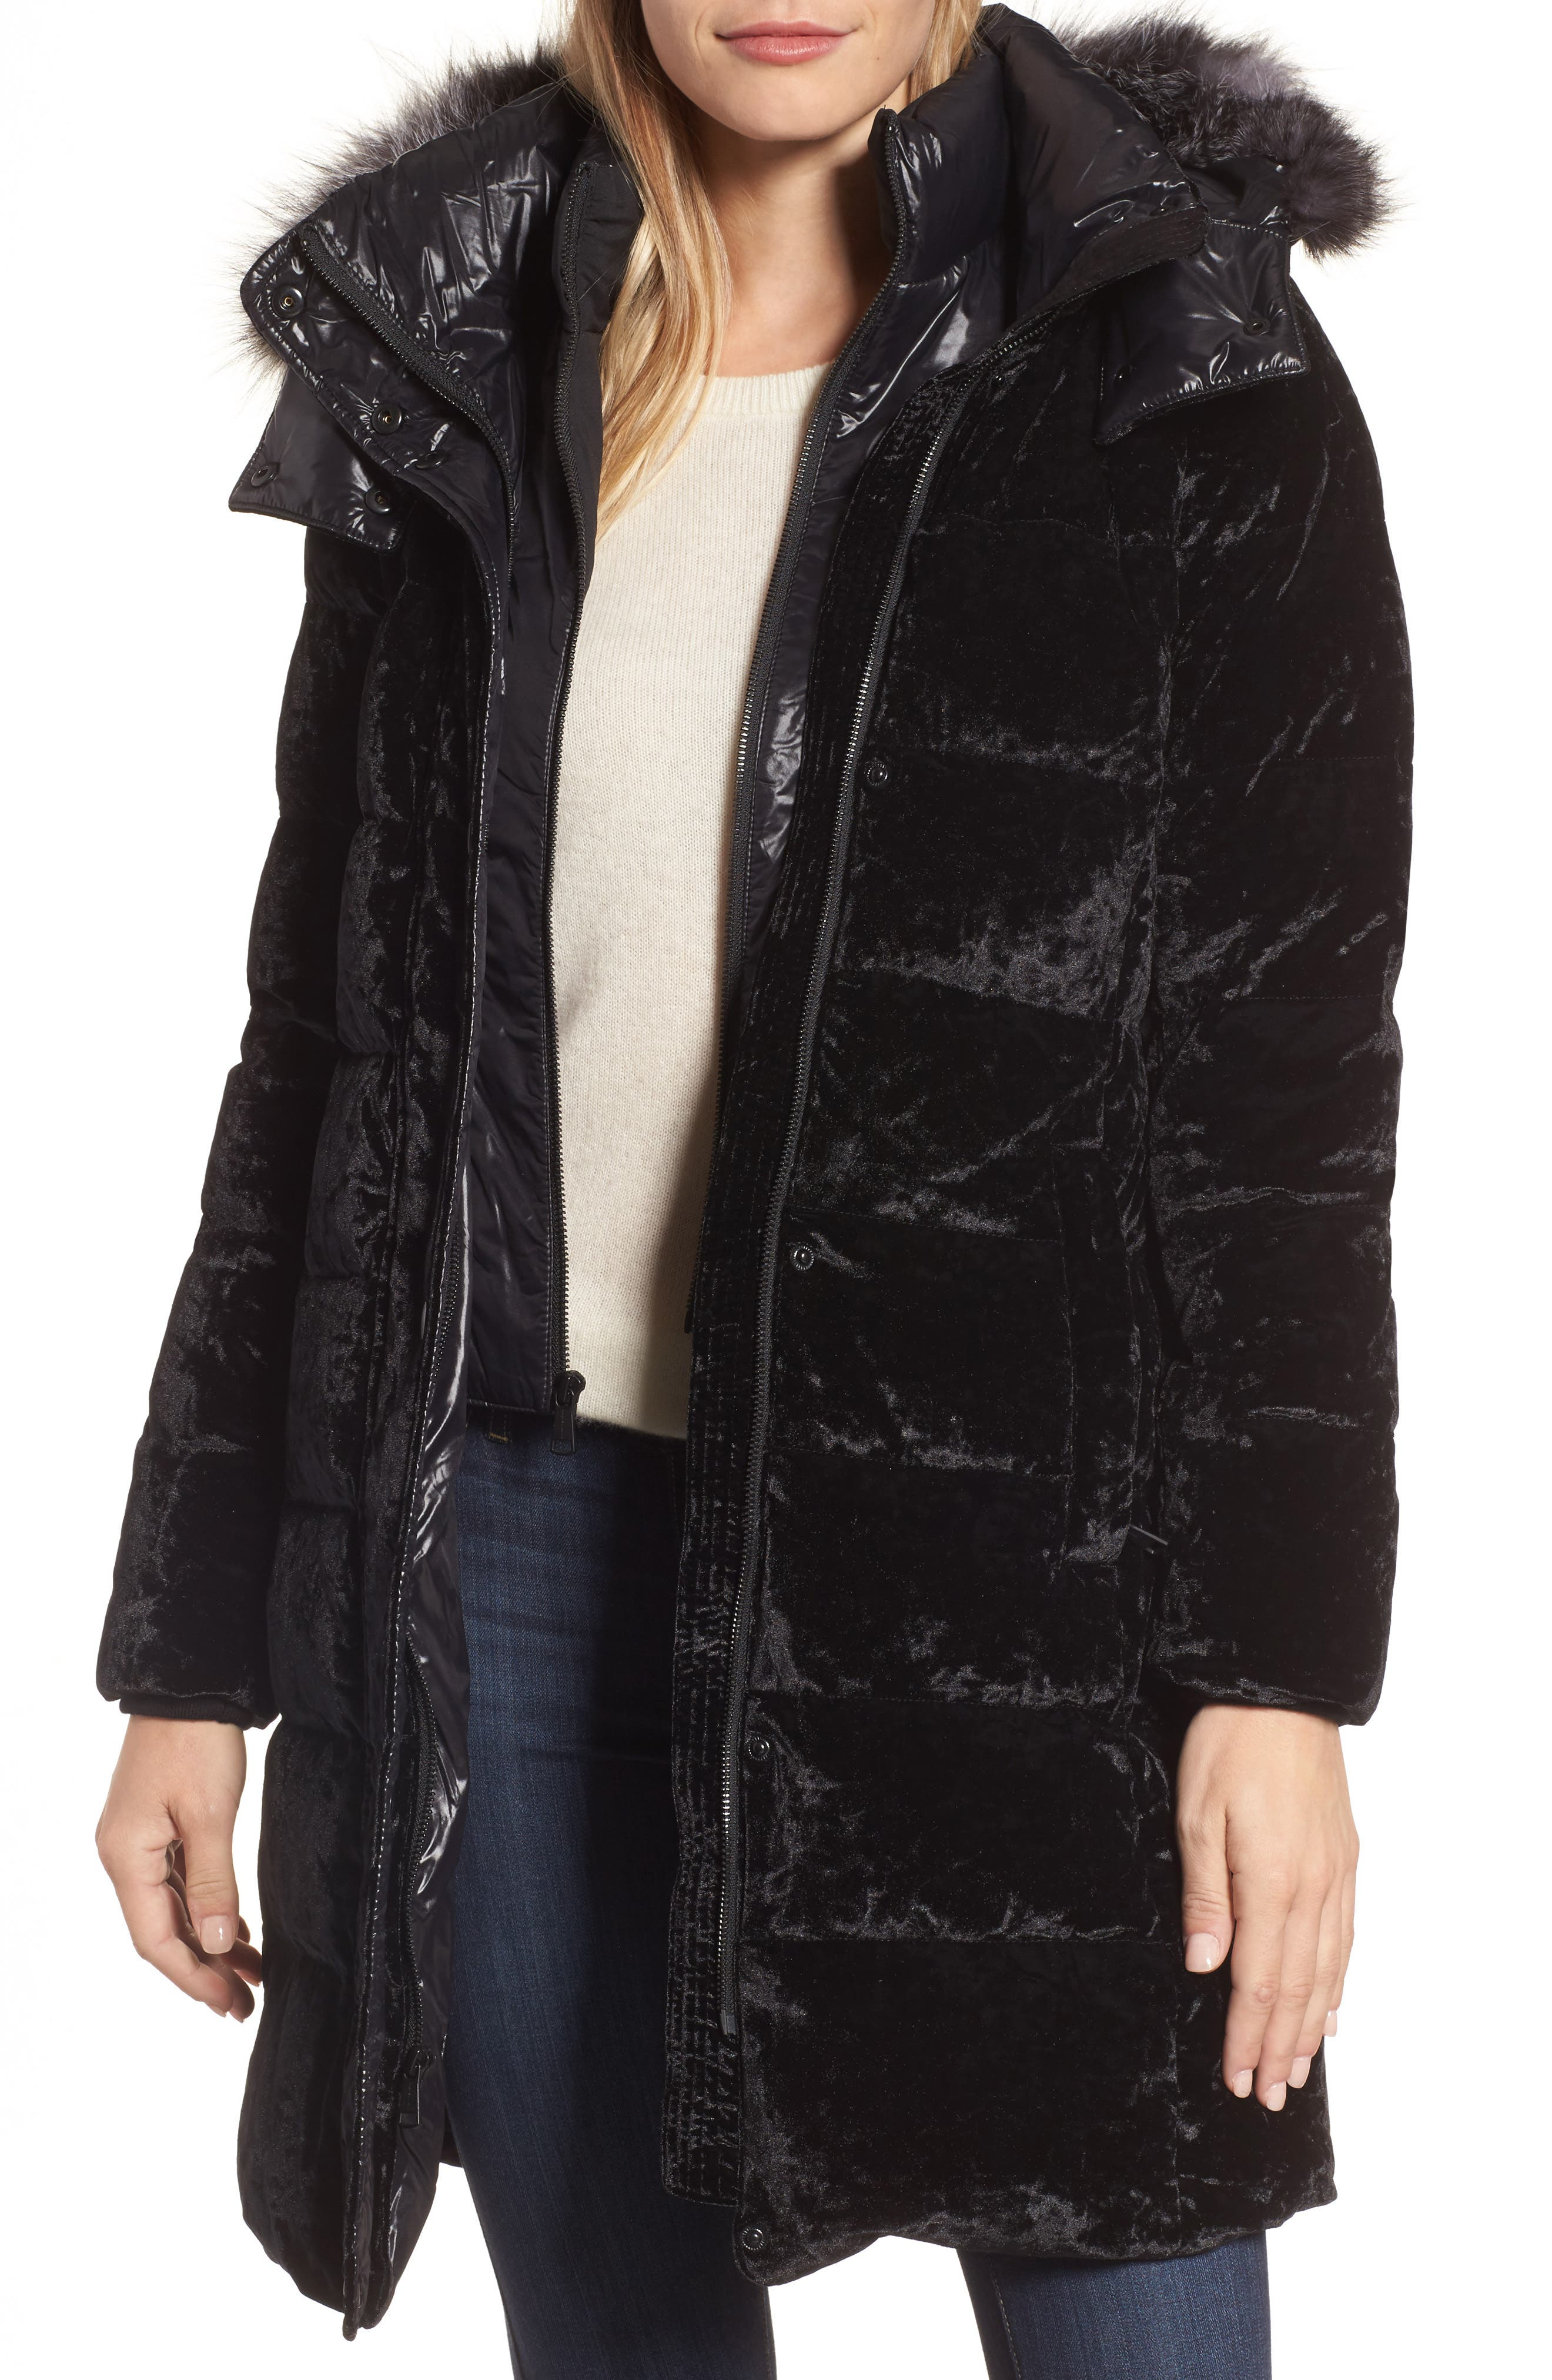 Velvet Down Jacket with Genuine Fox Fur,                             Main thumbnail 1, color,                             001